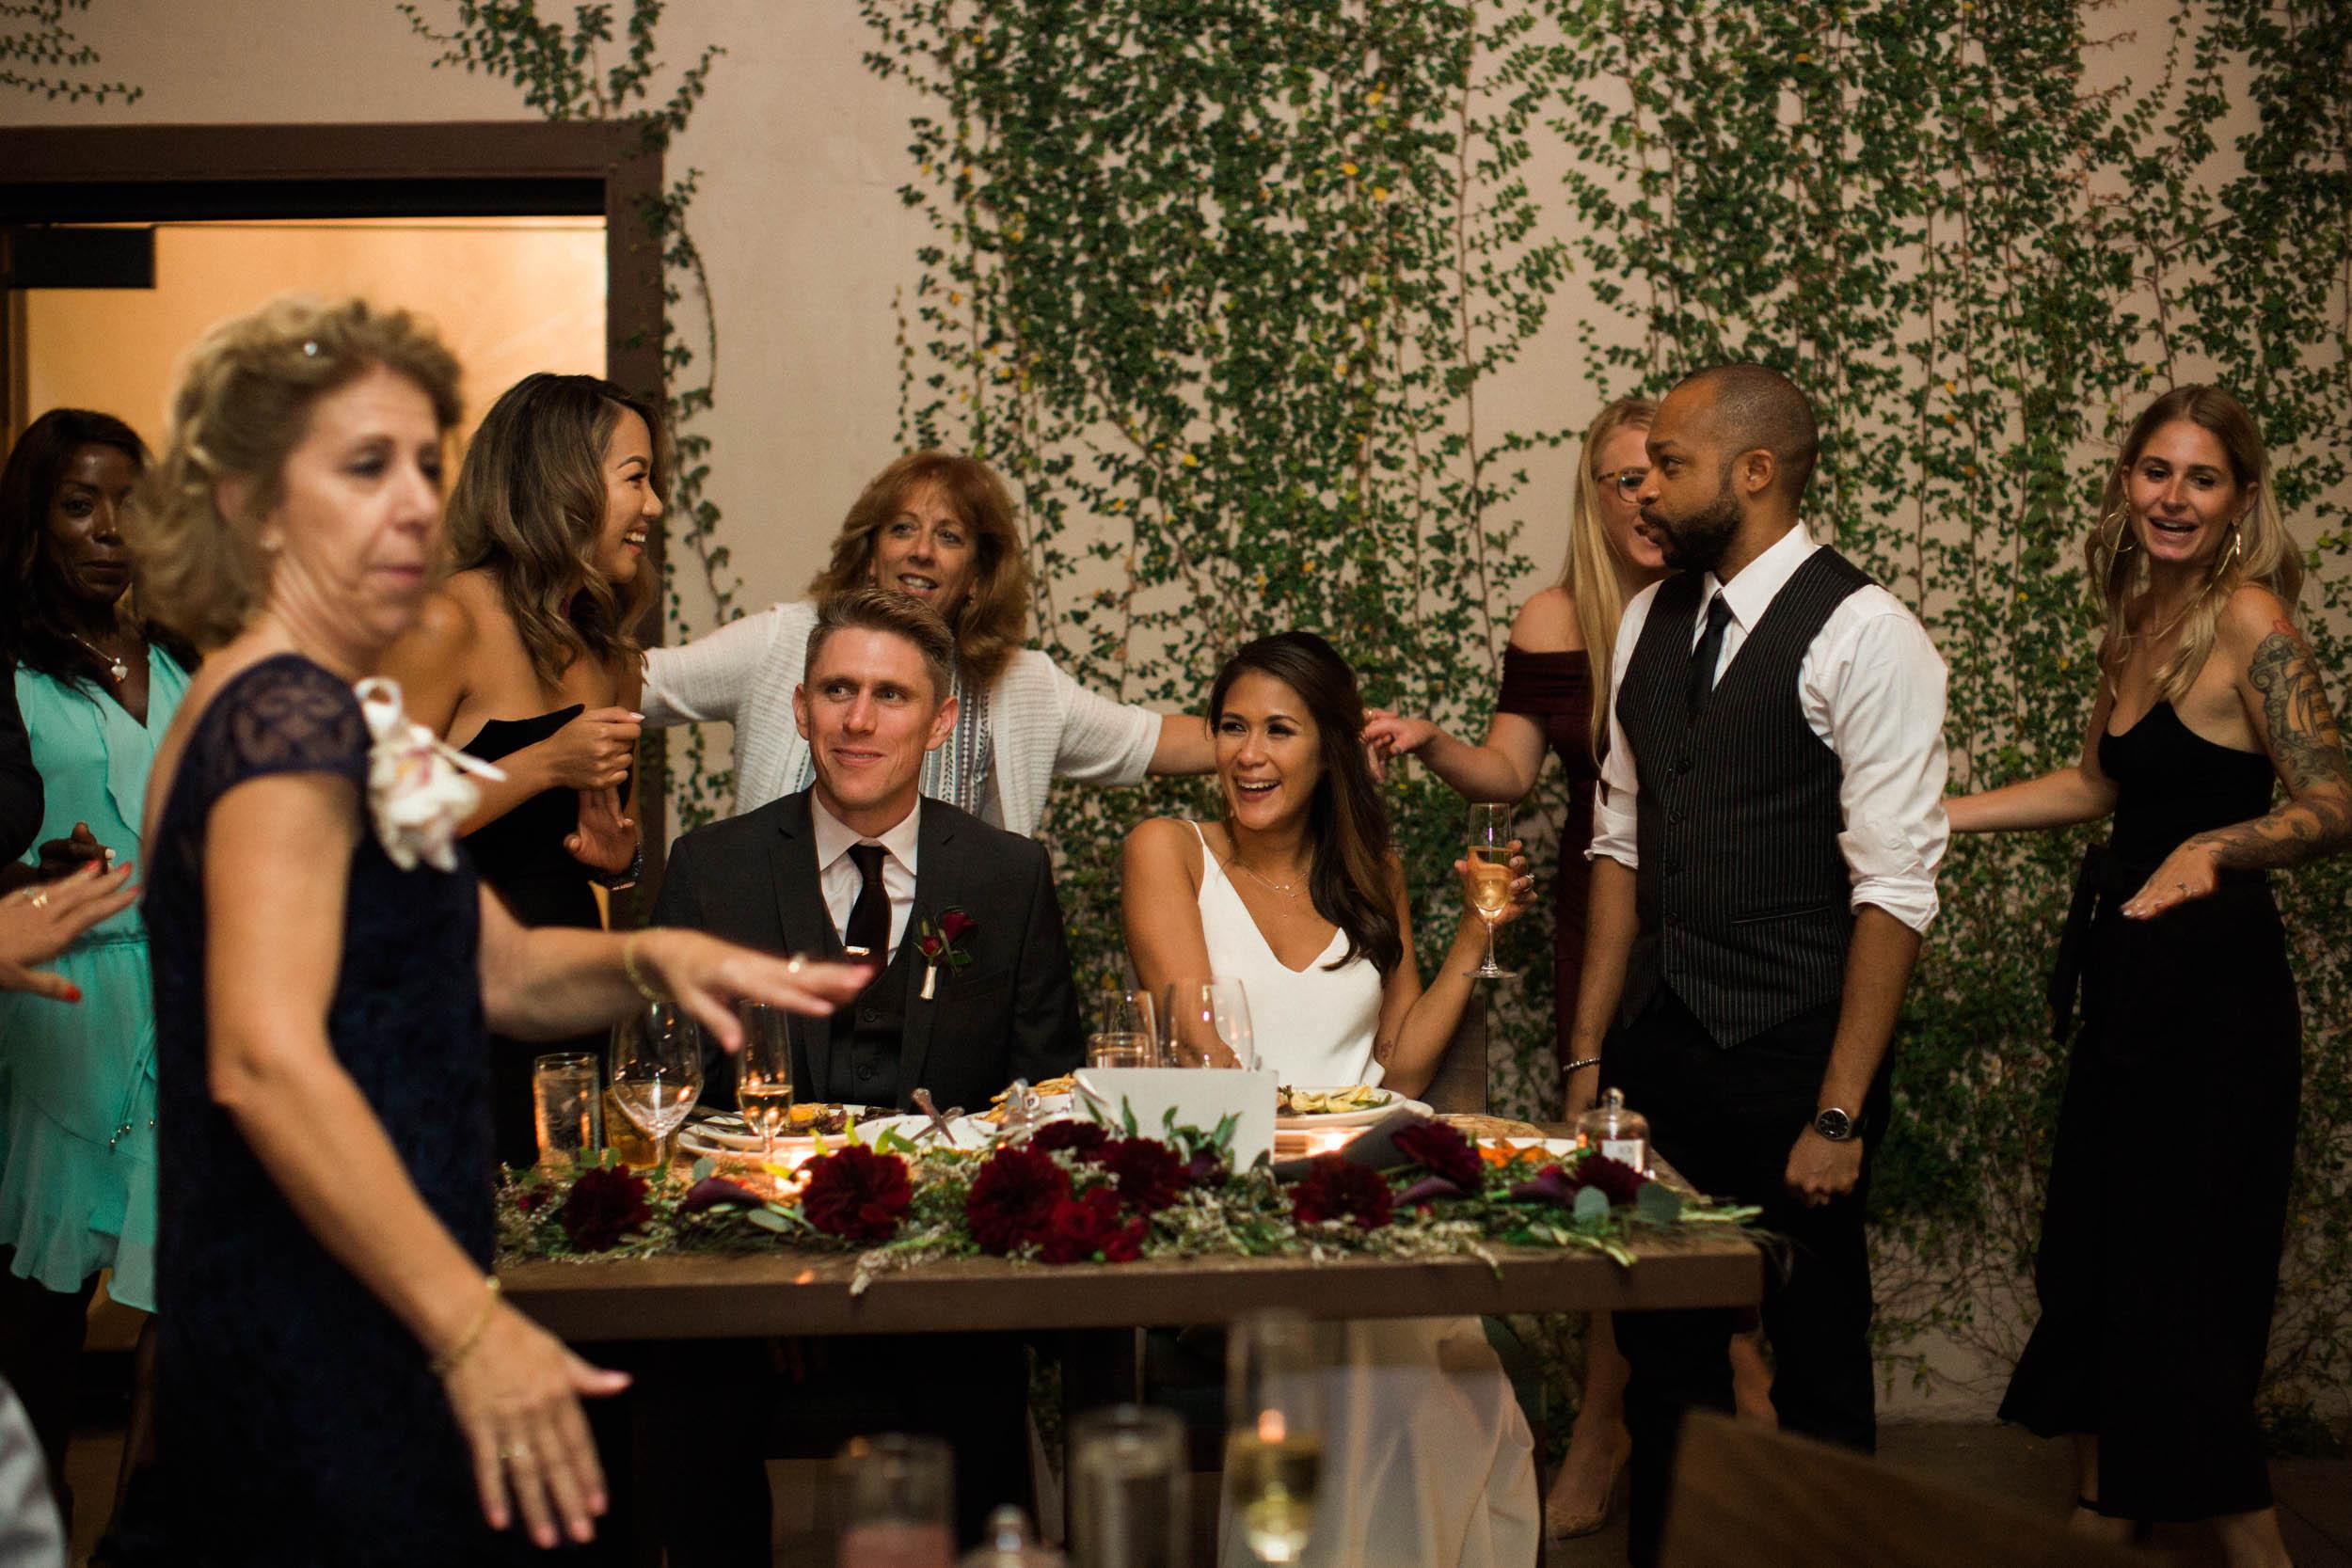 BKM-Photography-Highland-Park-Los-Angeles-Backyard-Wedding-0079.jpg